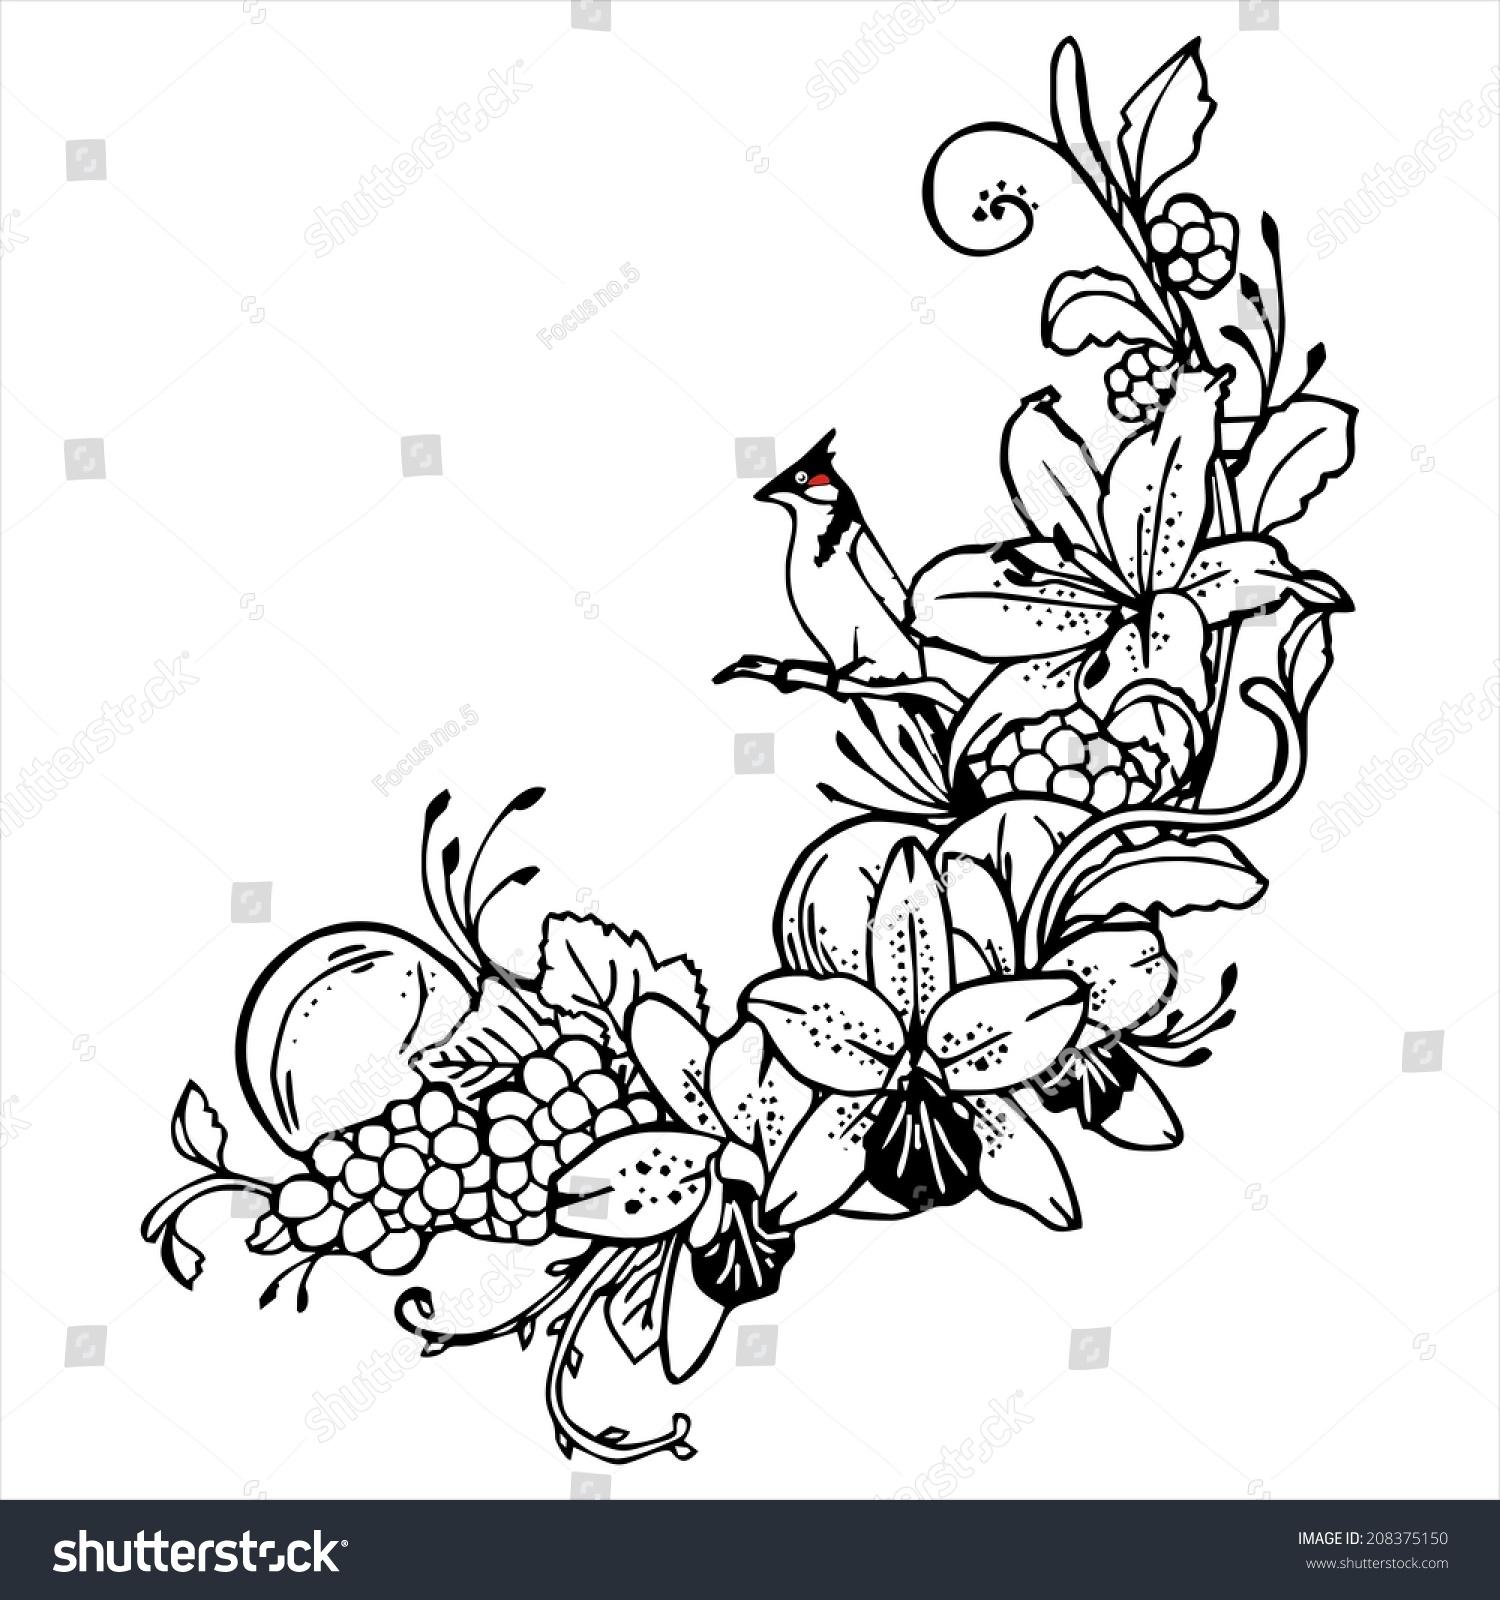 Shoe Flower Line Drawing : Royalty free bird orange flower line drawing vintage